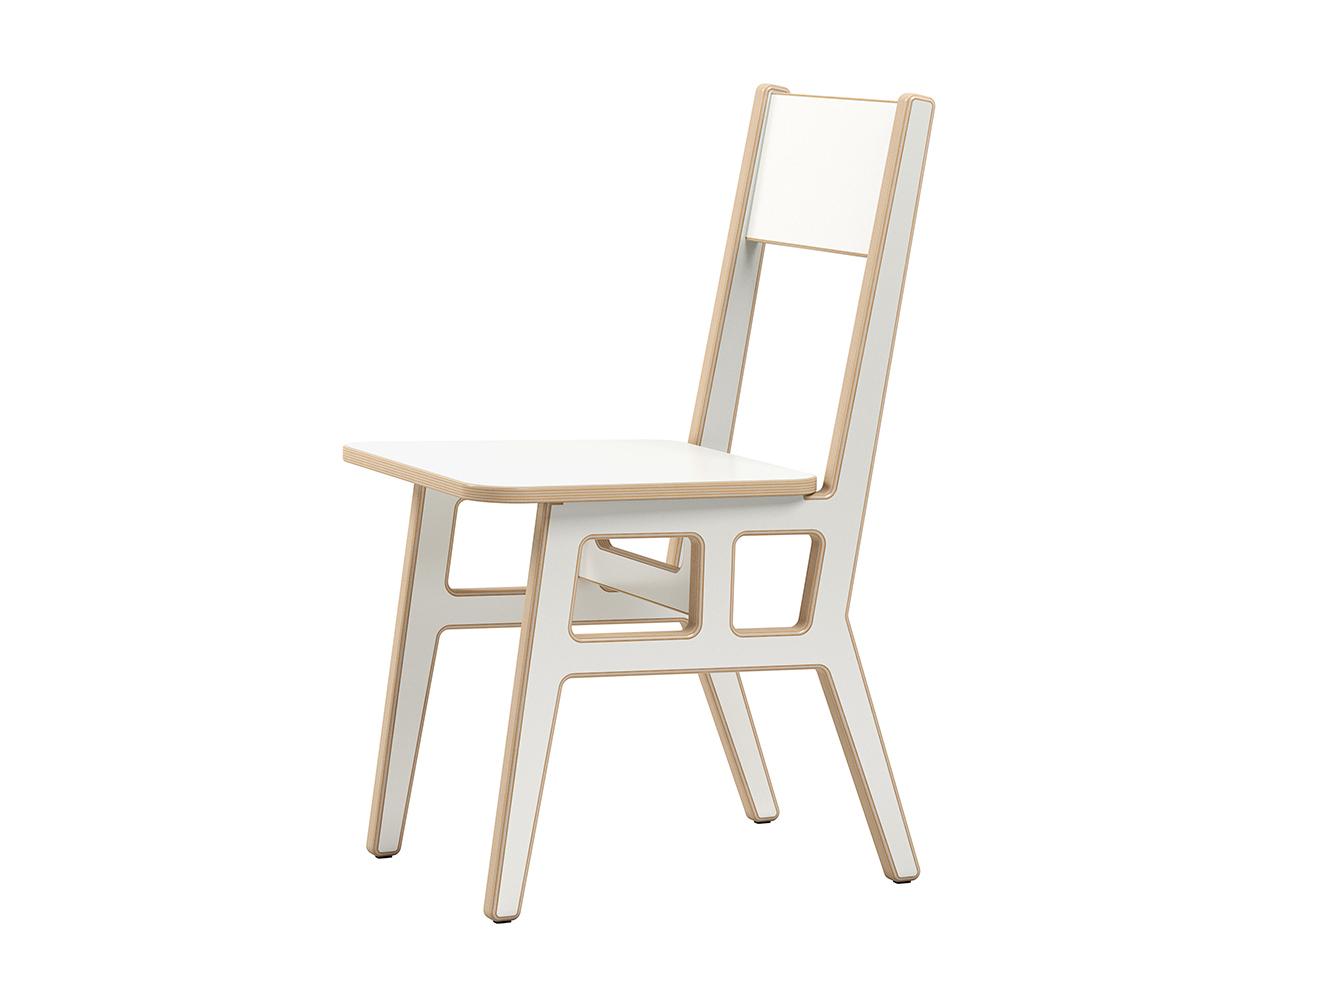 Кухонный стул Studiola 15434462 от thefurnish